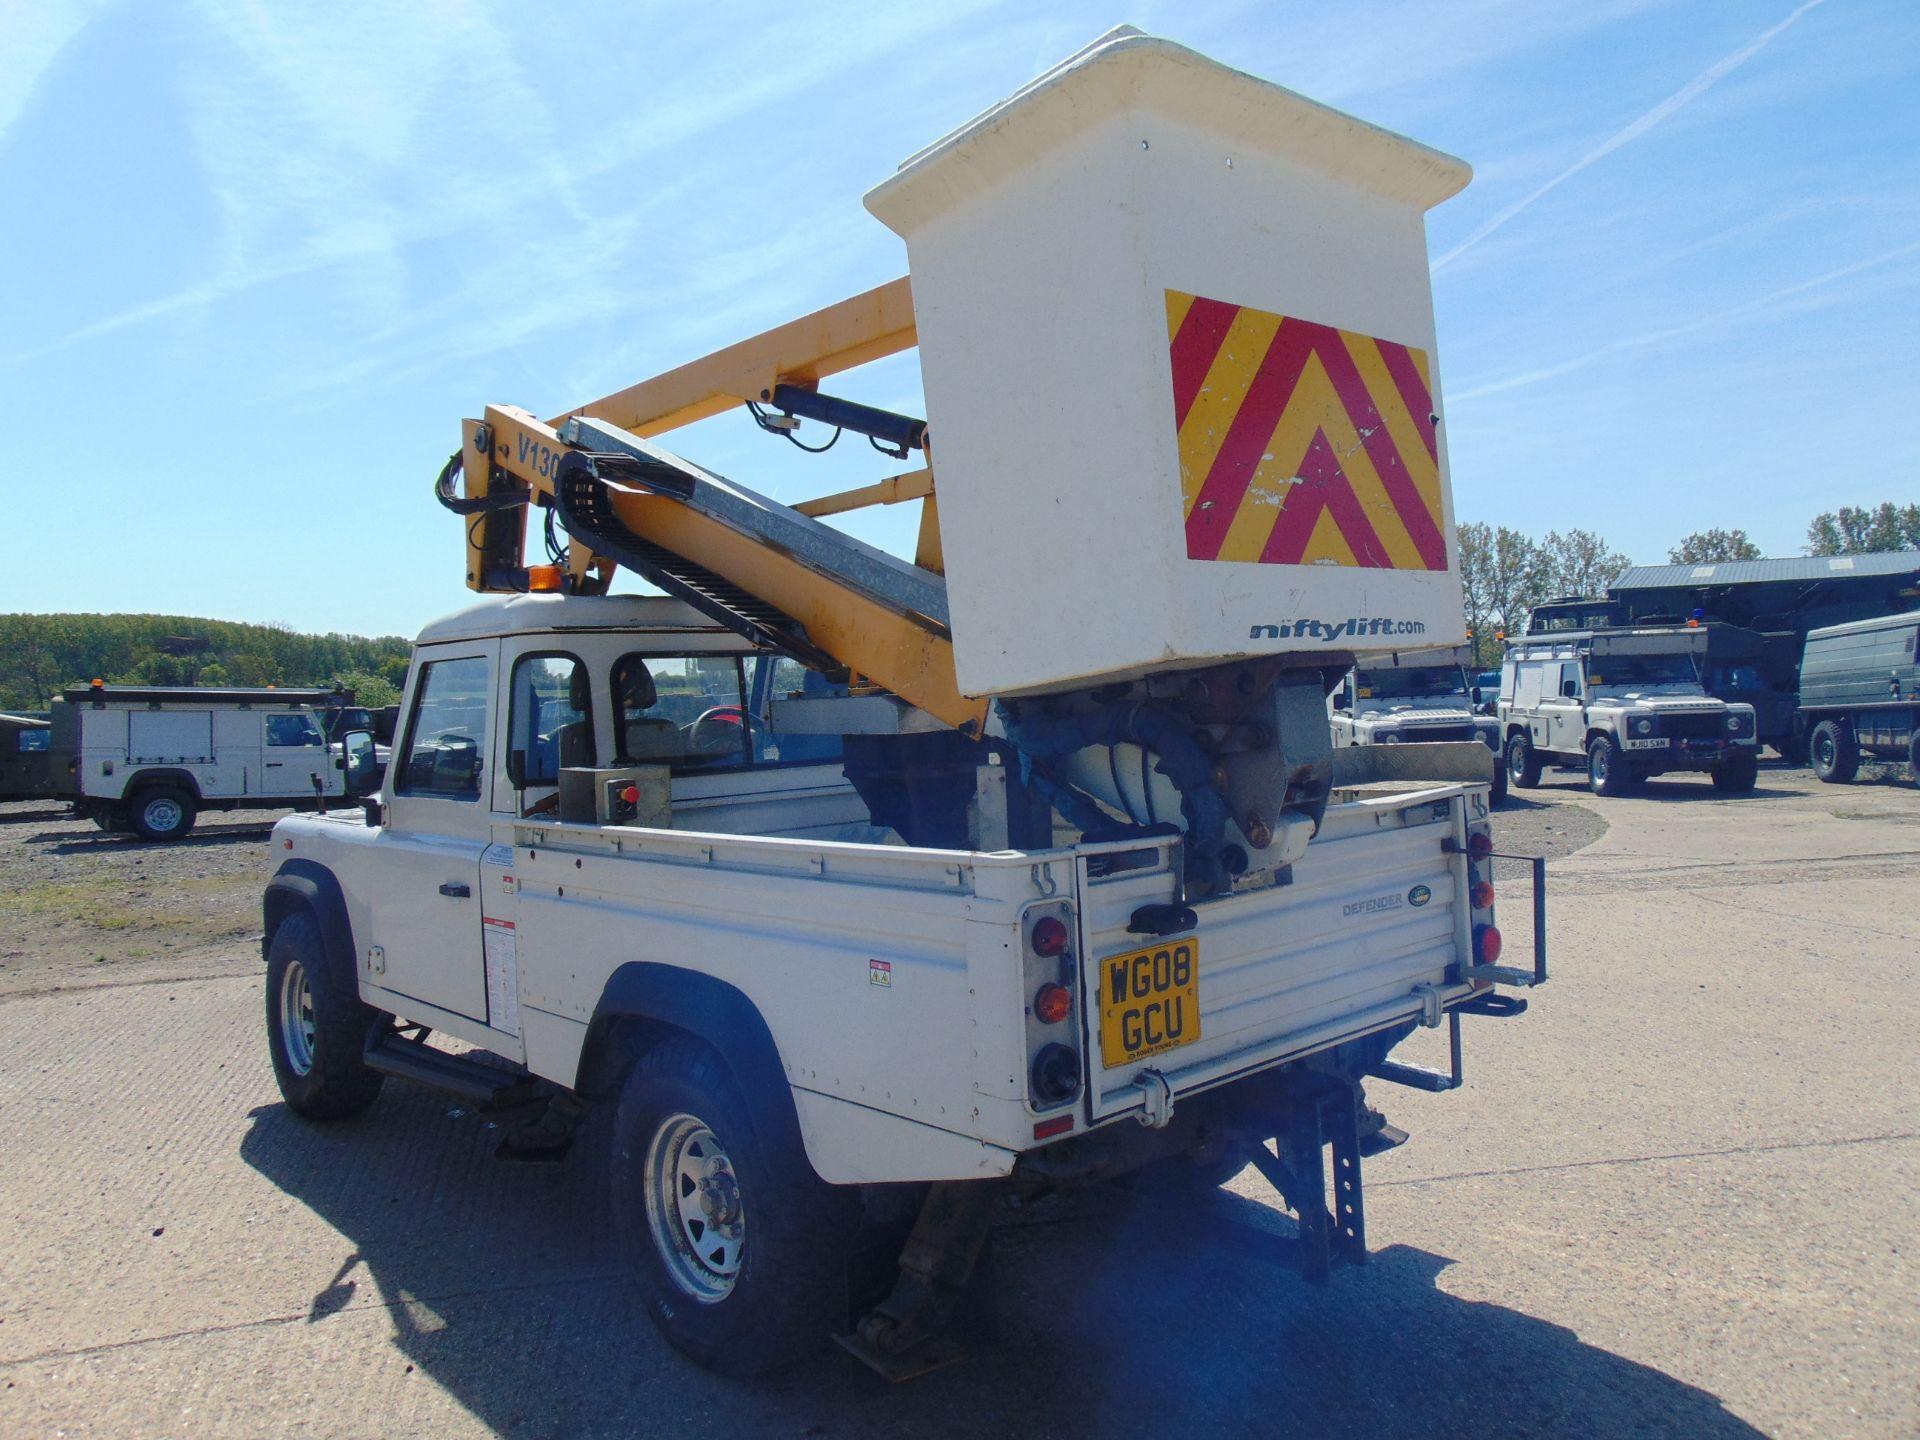 Lot 23 - Land Rover Defender 110 High Capacity Cherry Picker